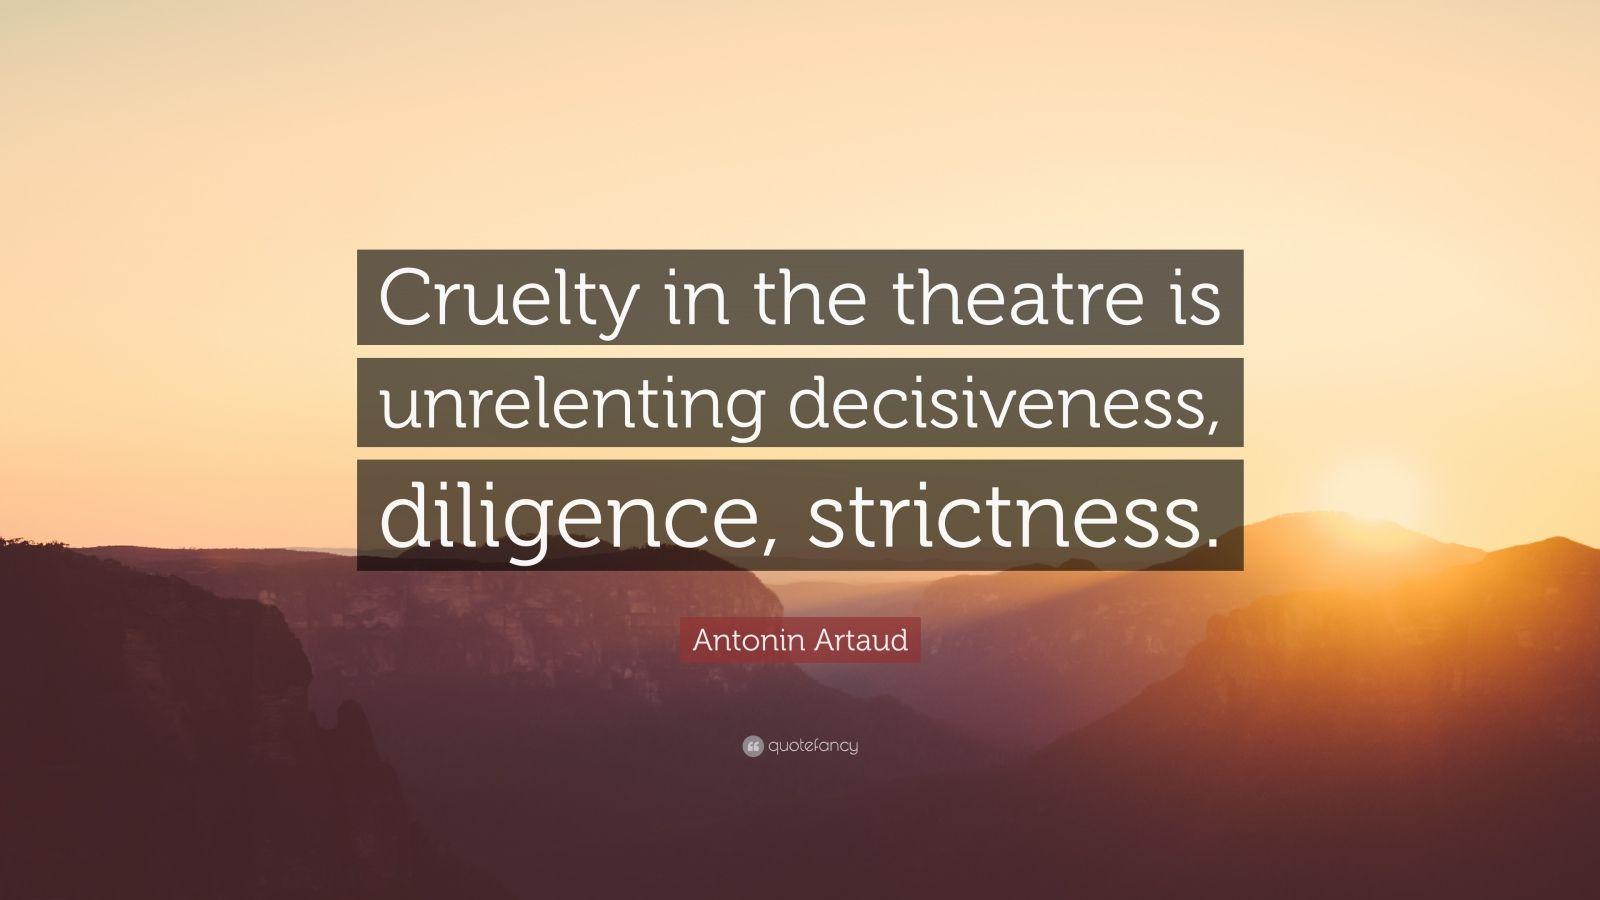 antonin artaud and the theatre of cruelty english literature essay Antonin artaud: an impossible mind when i first read artaud's essay, van gogh: antonin artaud also created a theatre of cruelty, a theatre like no other.